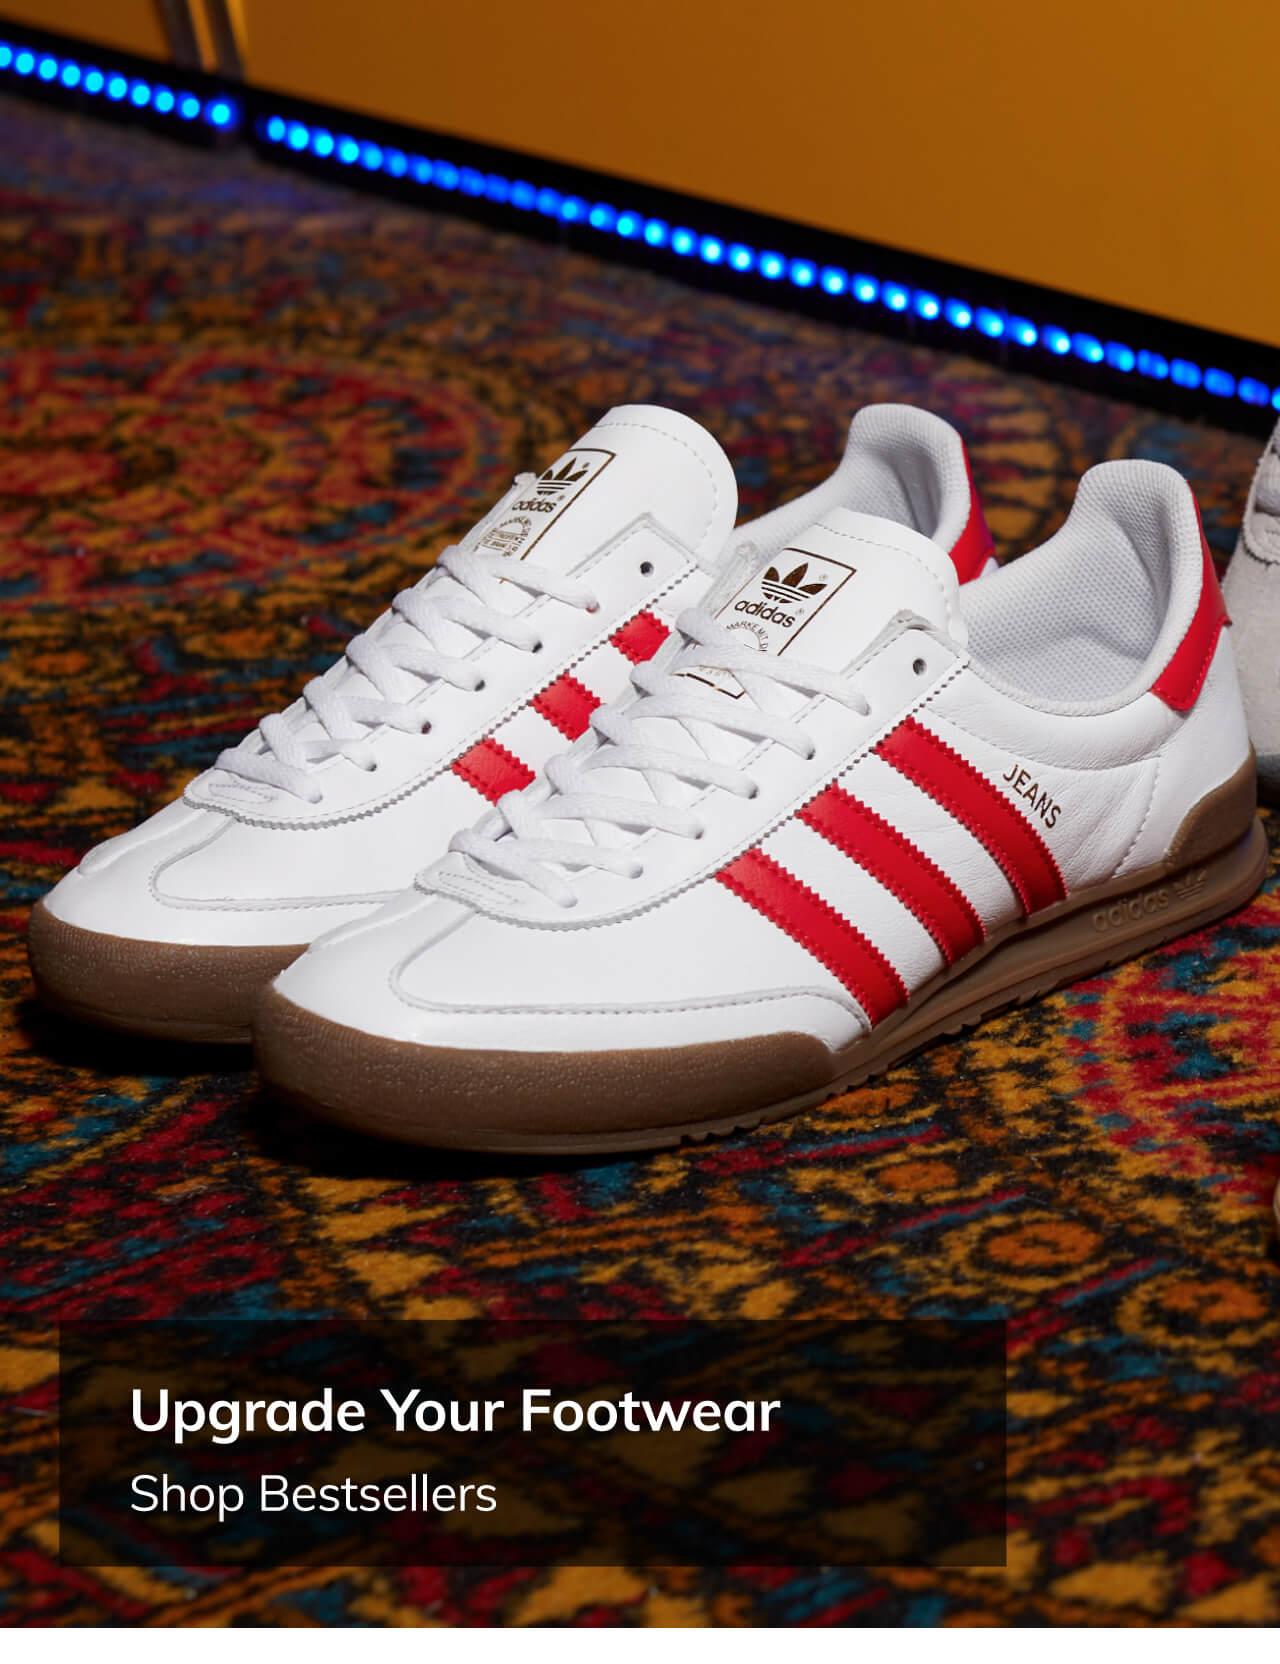 Upgrade Your Footwear